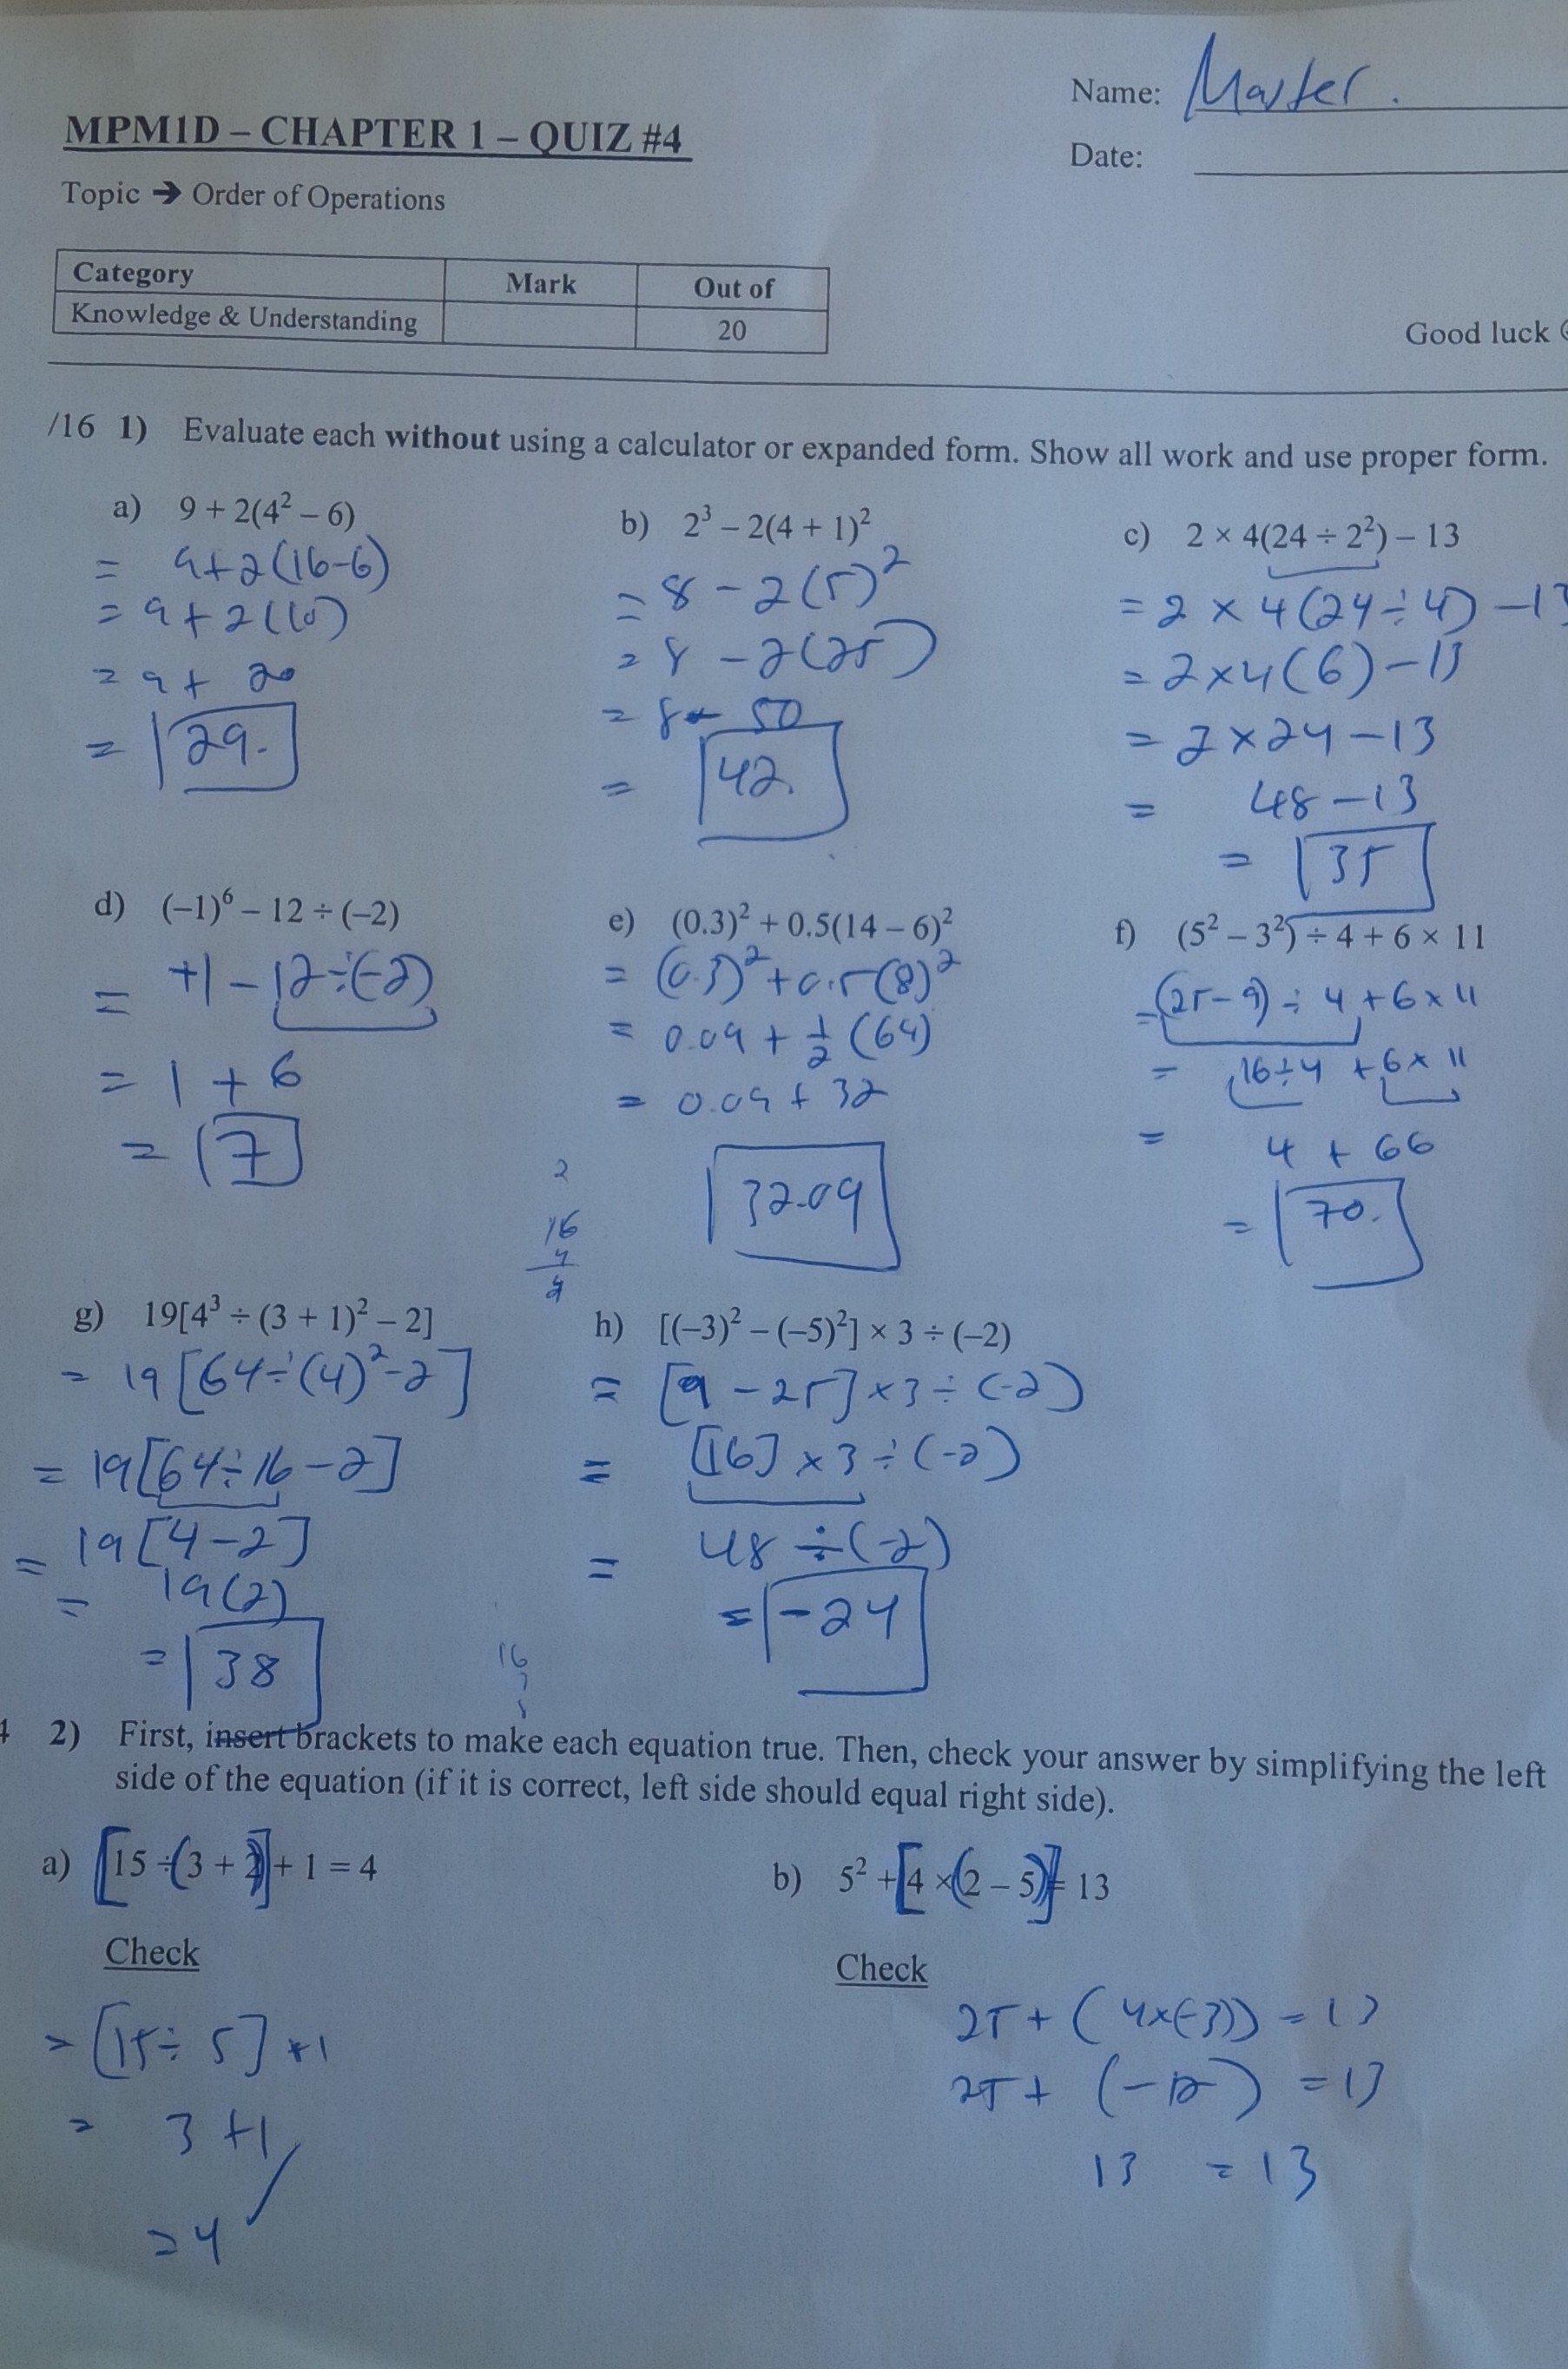 Solving Quadratic Equationscompleting The Square Worksheet With Solving Quadratic Equations By Completing The Square Worksheet Answer Key